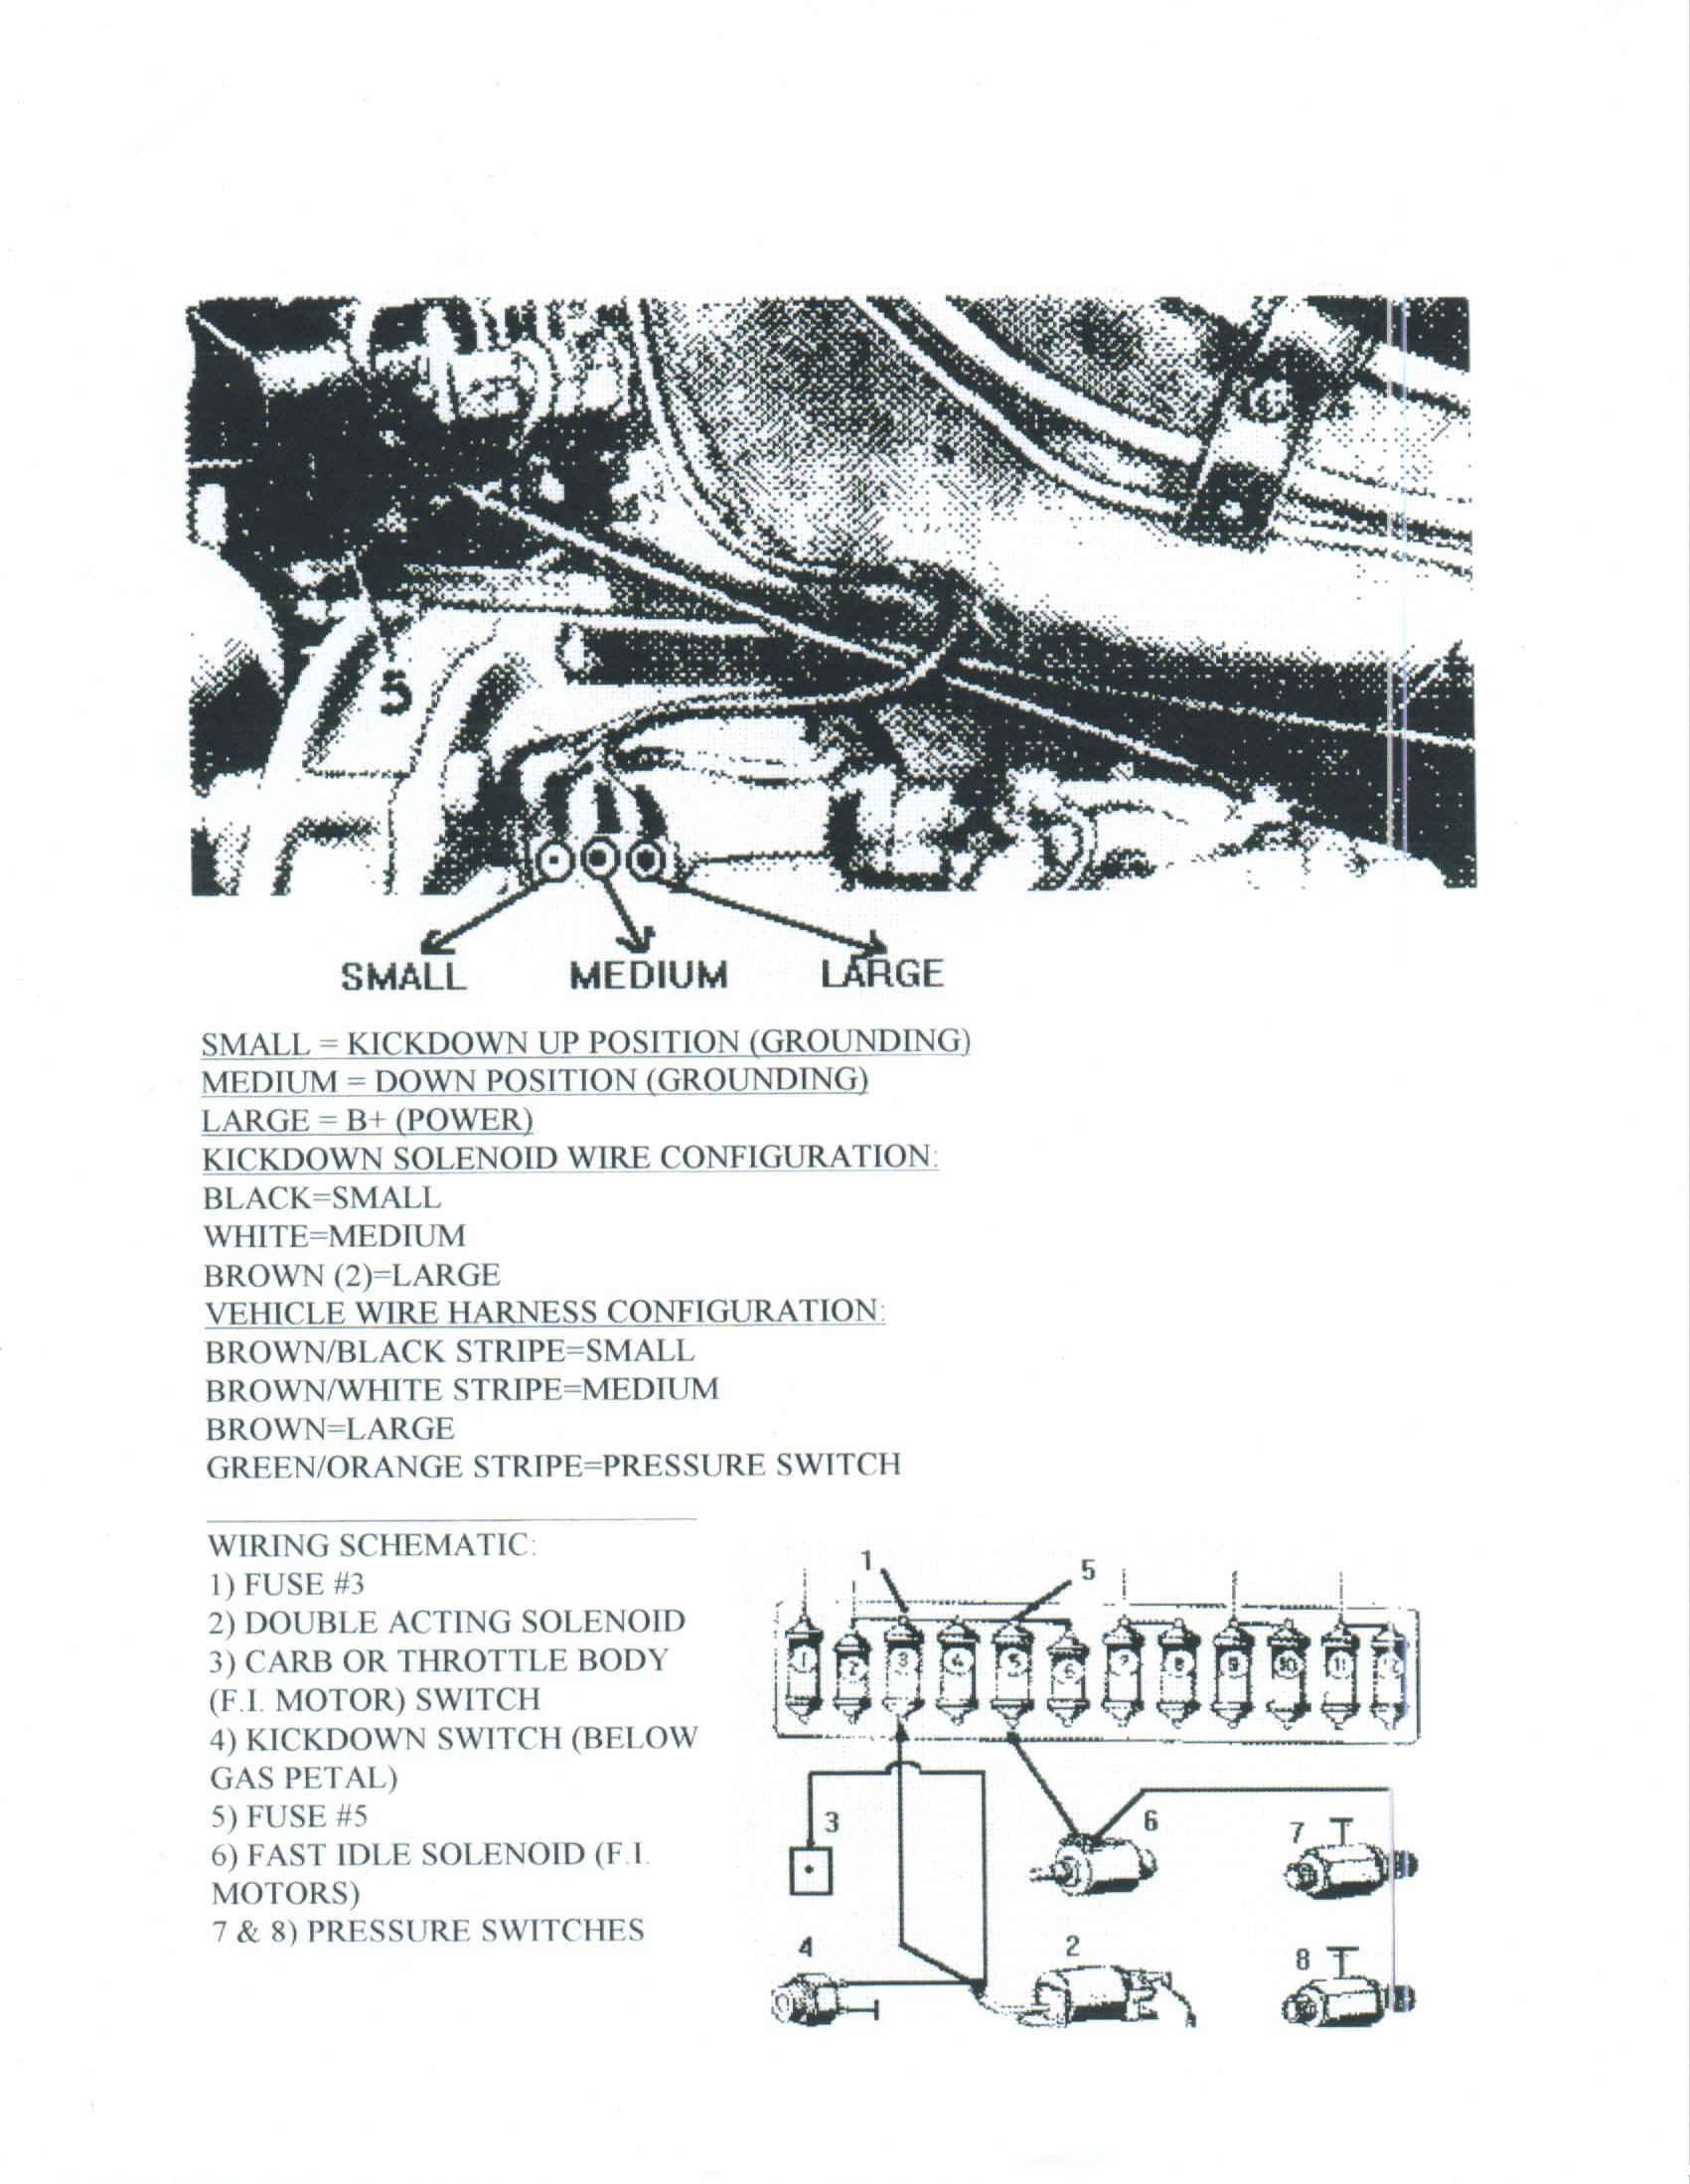 16 Bolt Installation And Adjustment Instructions